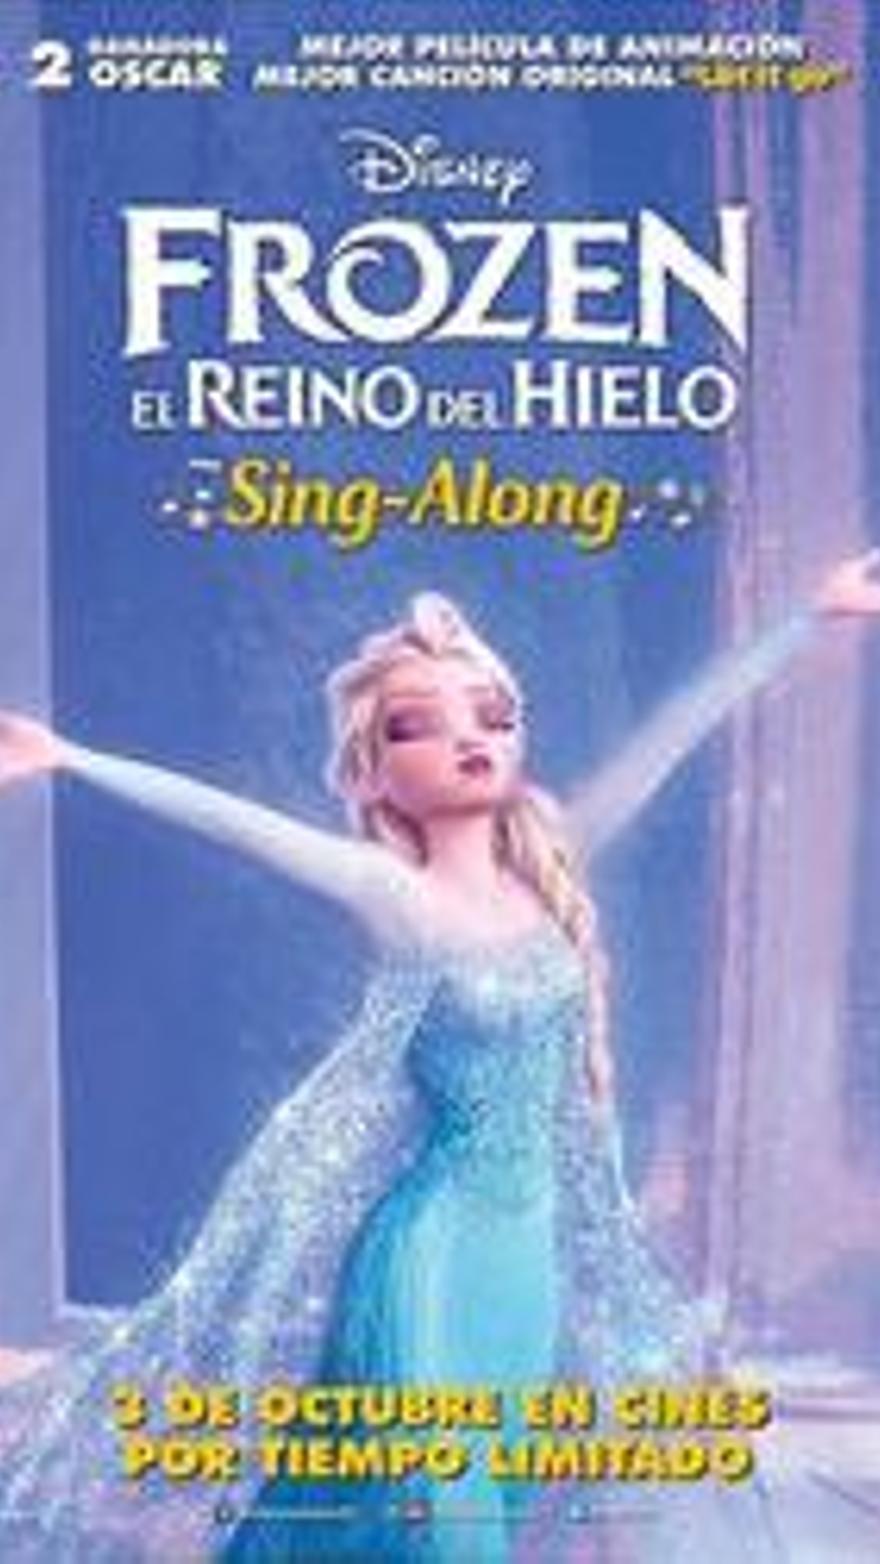 Frozen el reino de hielo, sing along